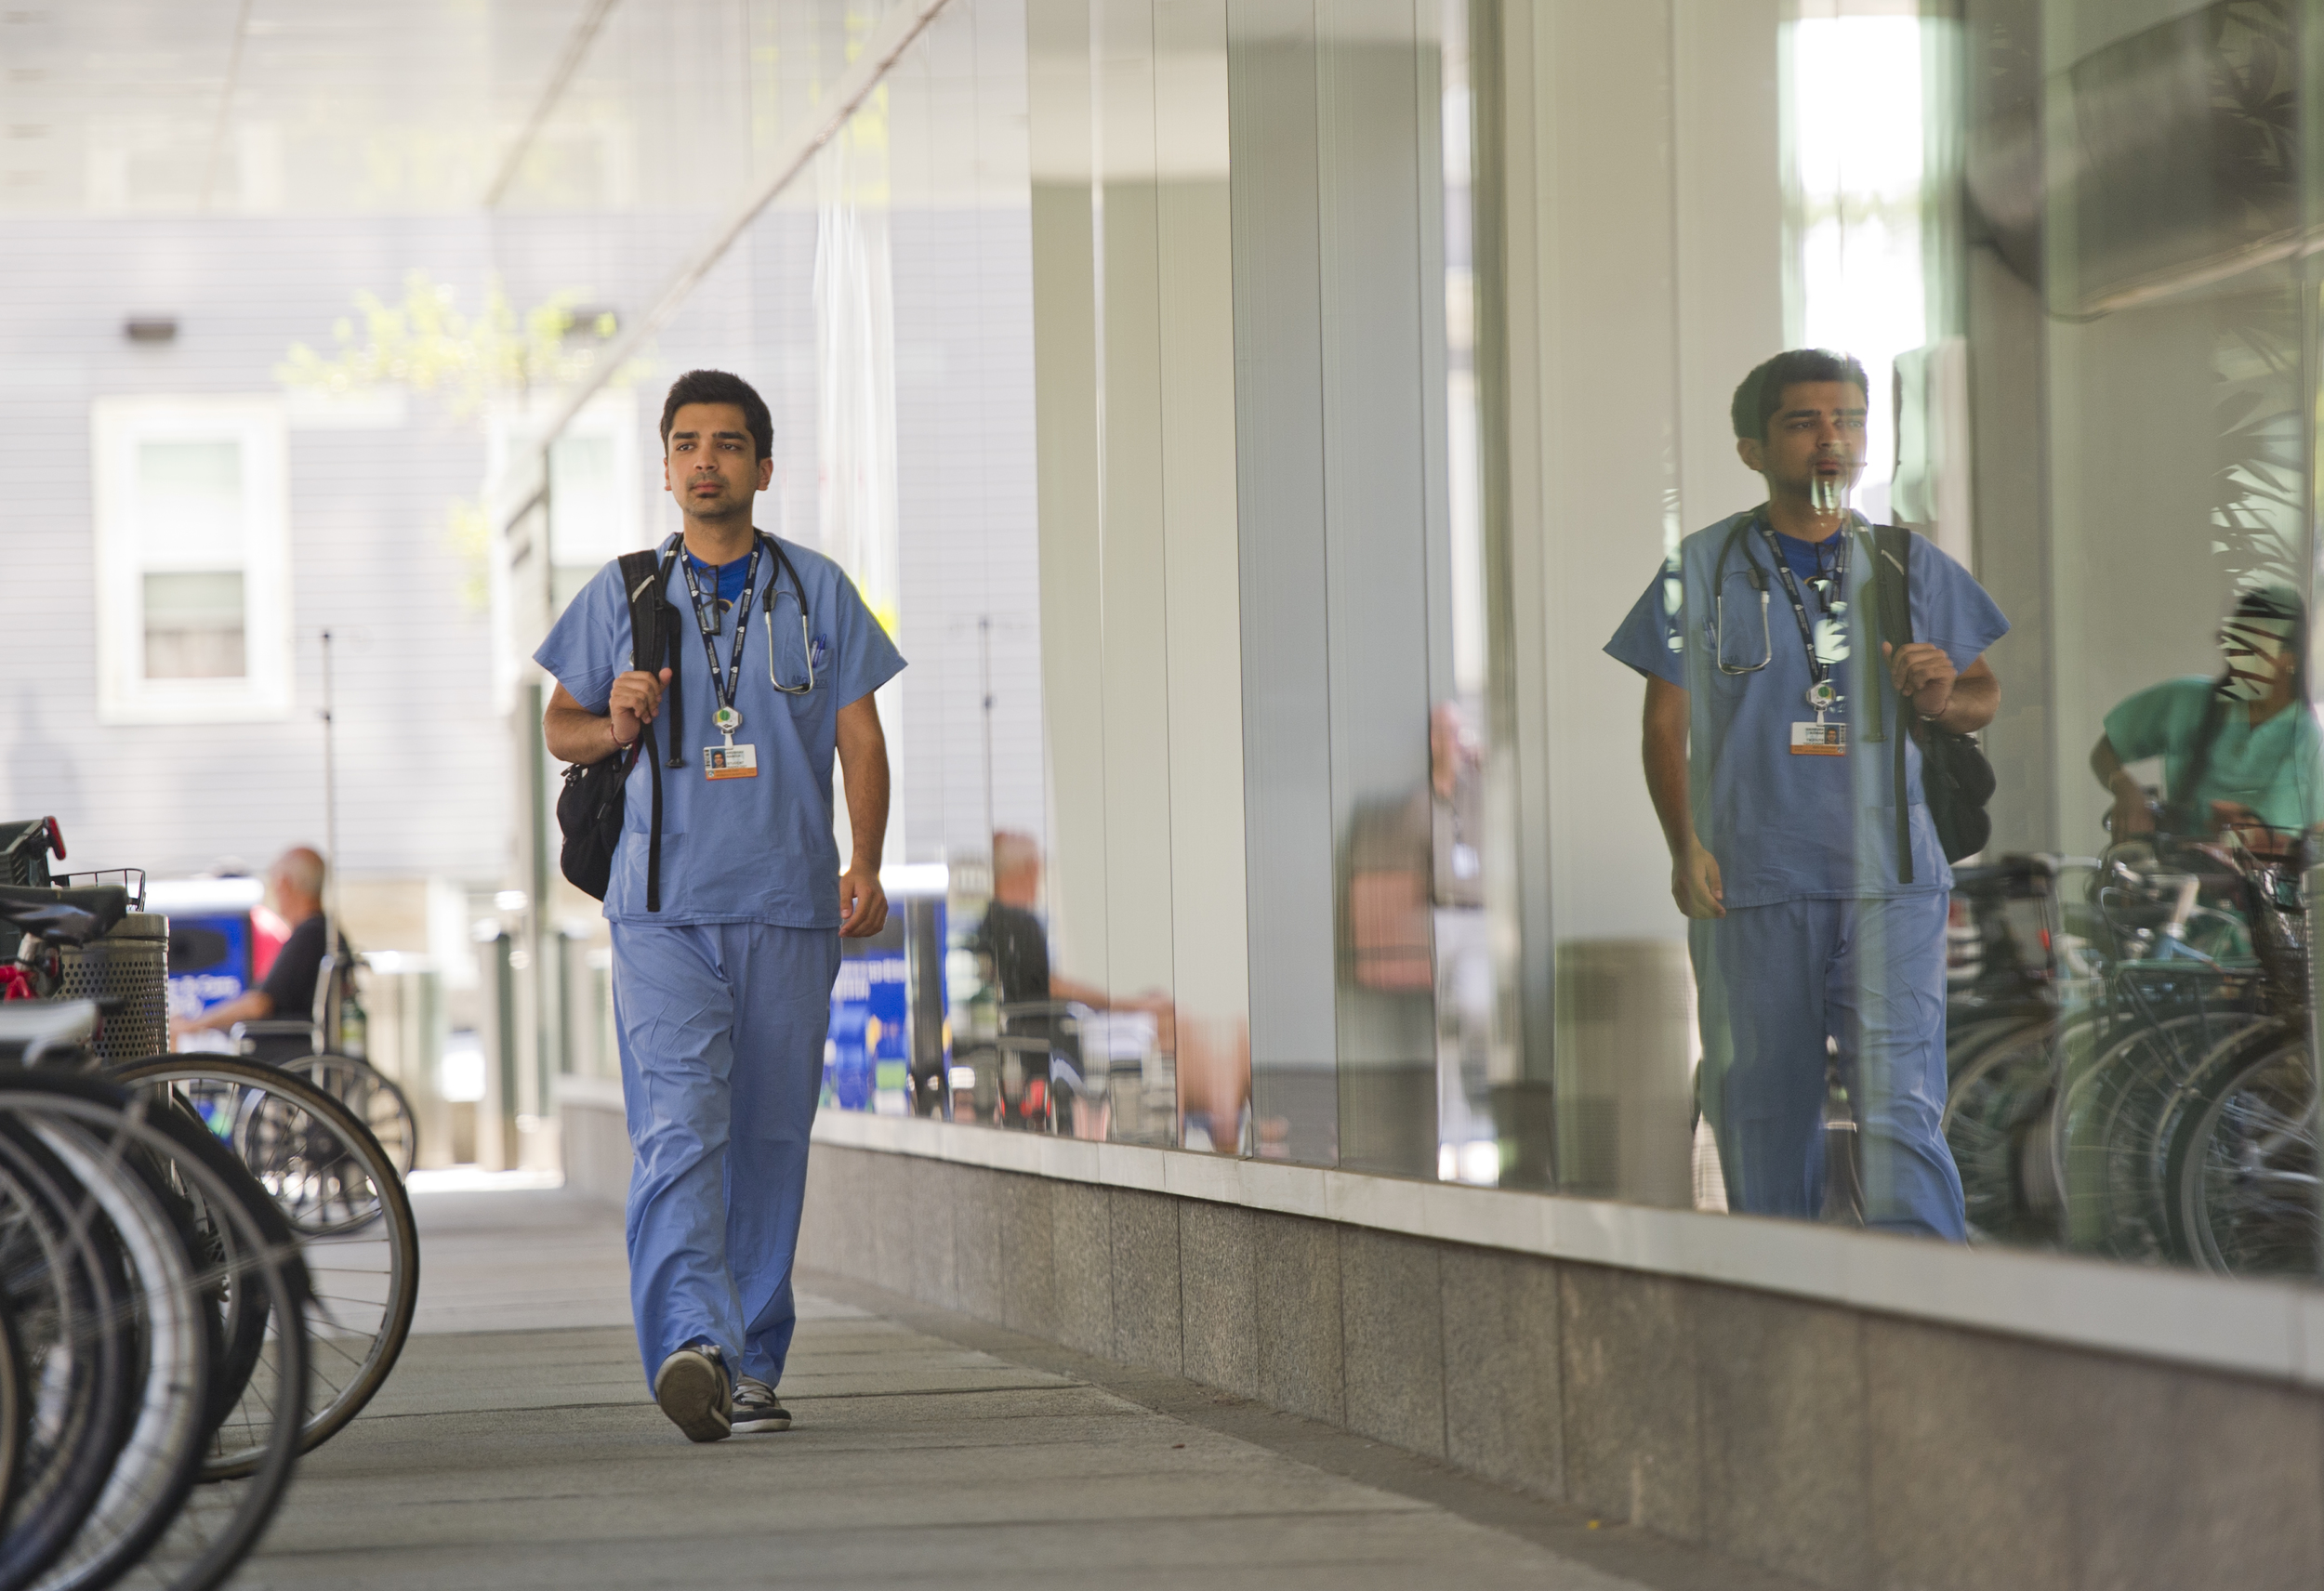 Anubhav Nangia (SAR,'15) spent his summer internship working at the Shapiro Cardiovascular Center at Brigham & Women's Hospital.Photo by Cydney Scott for Boston University Photograph